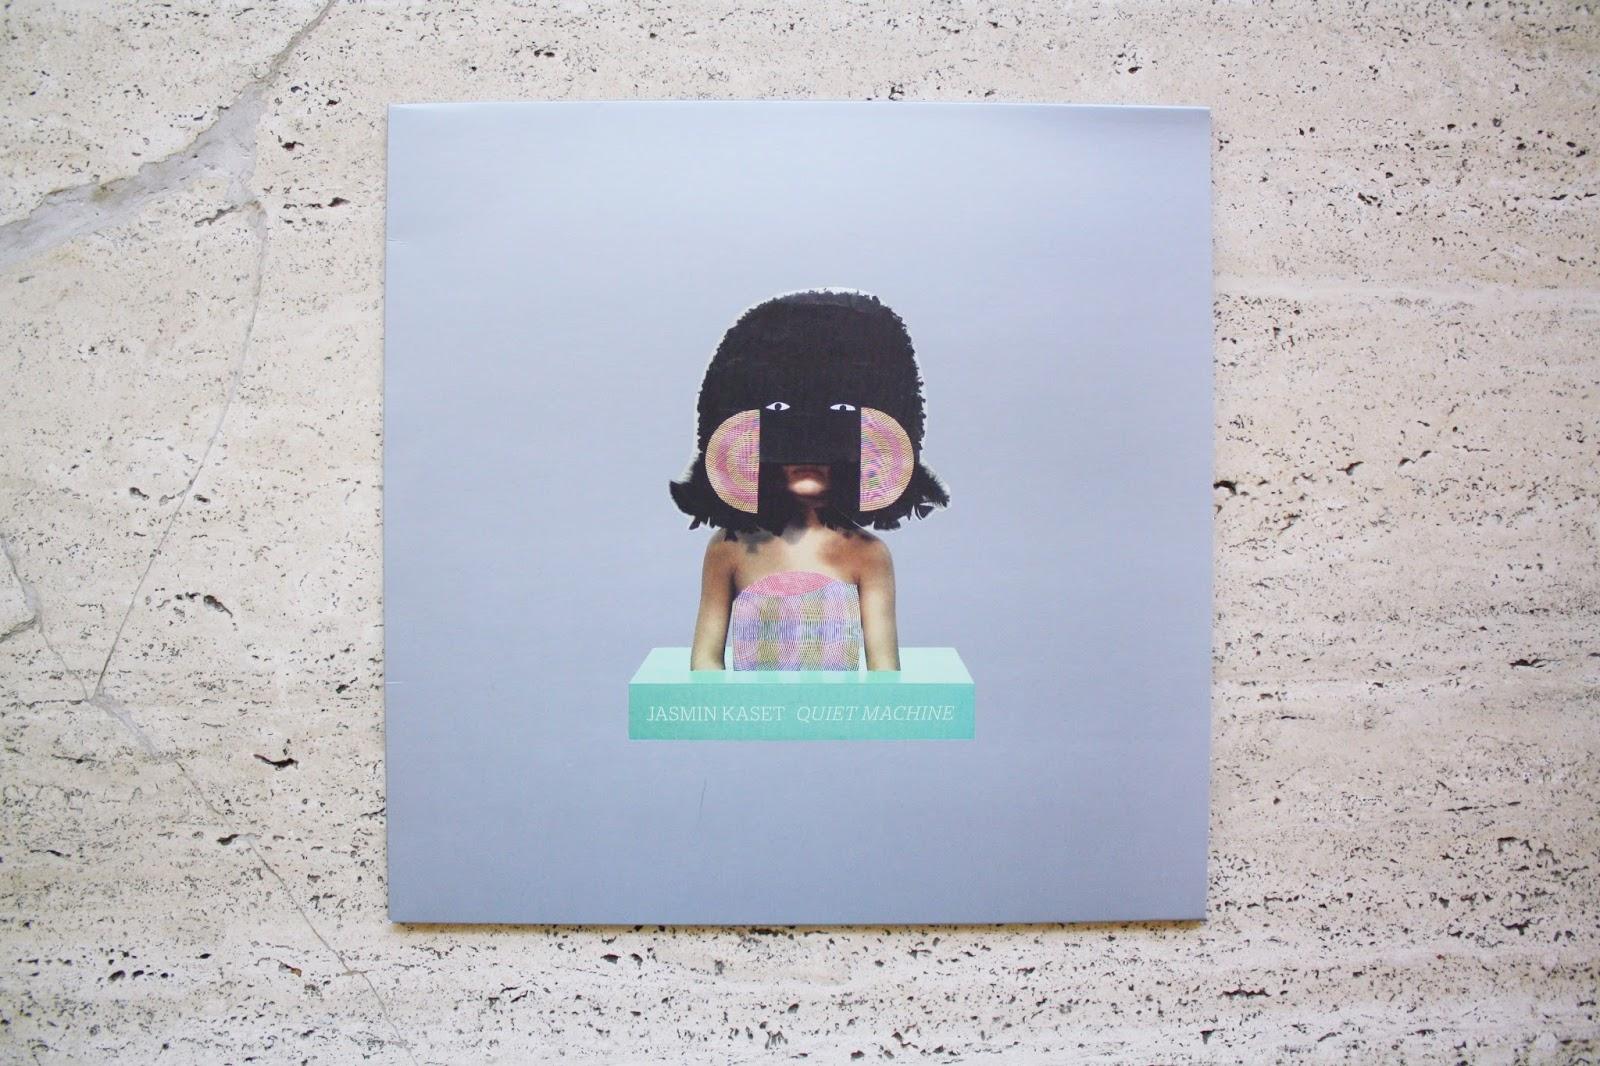 jasmin kaset vinyl